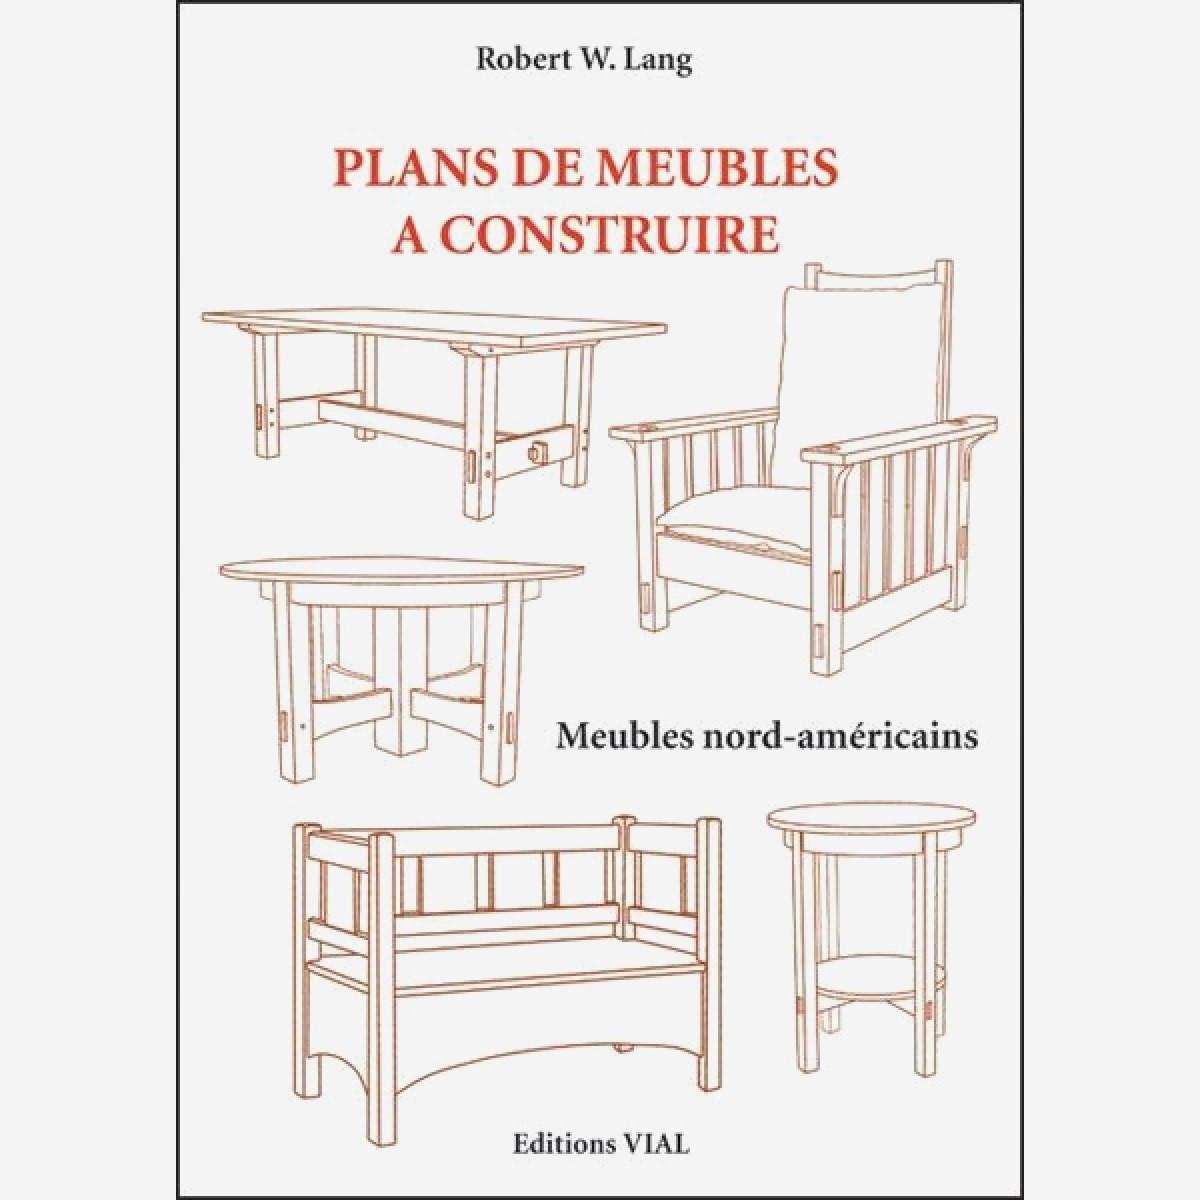 plan meuble palette pdf 70 plan meuble palette pdf of plan meuble palette pdf